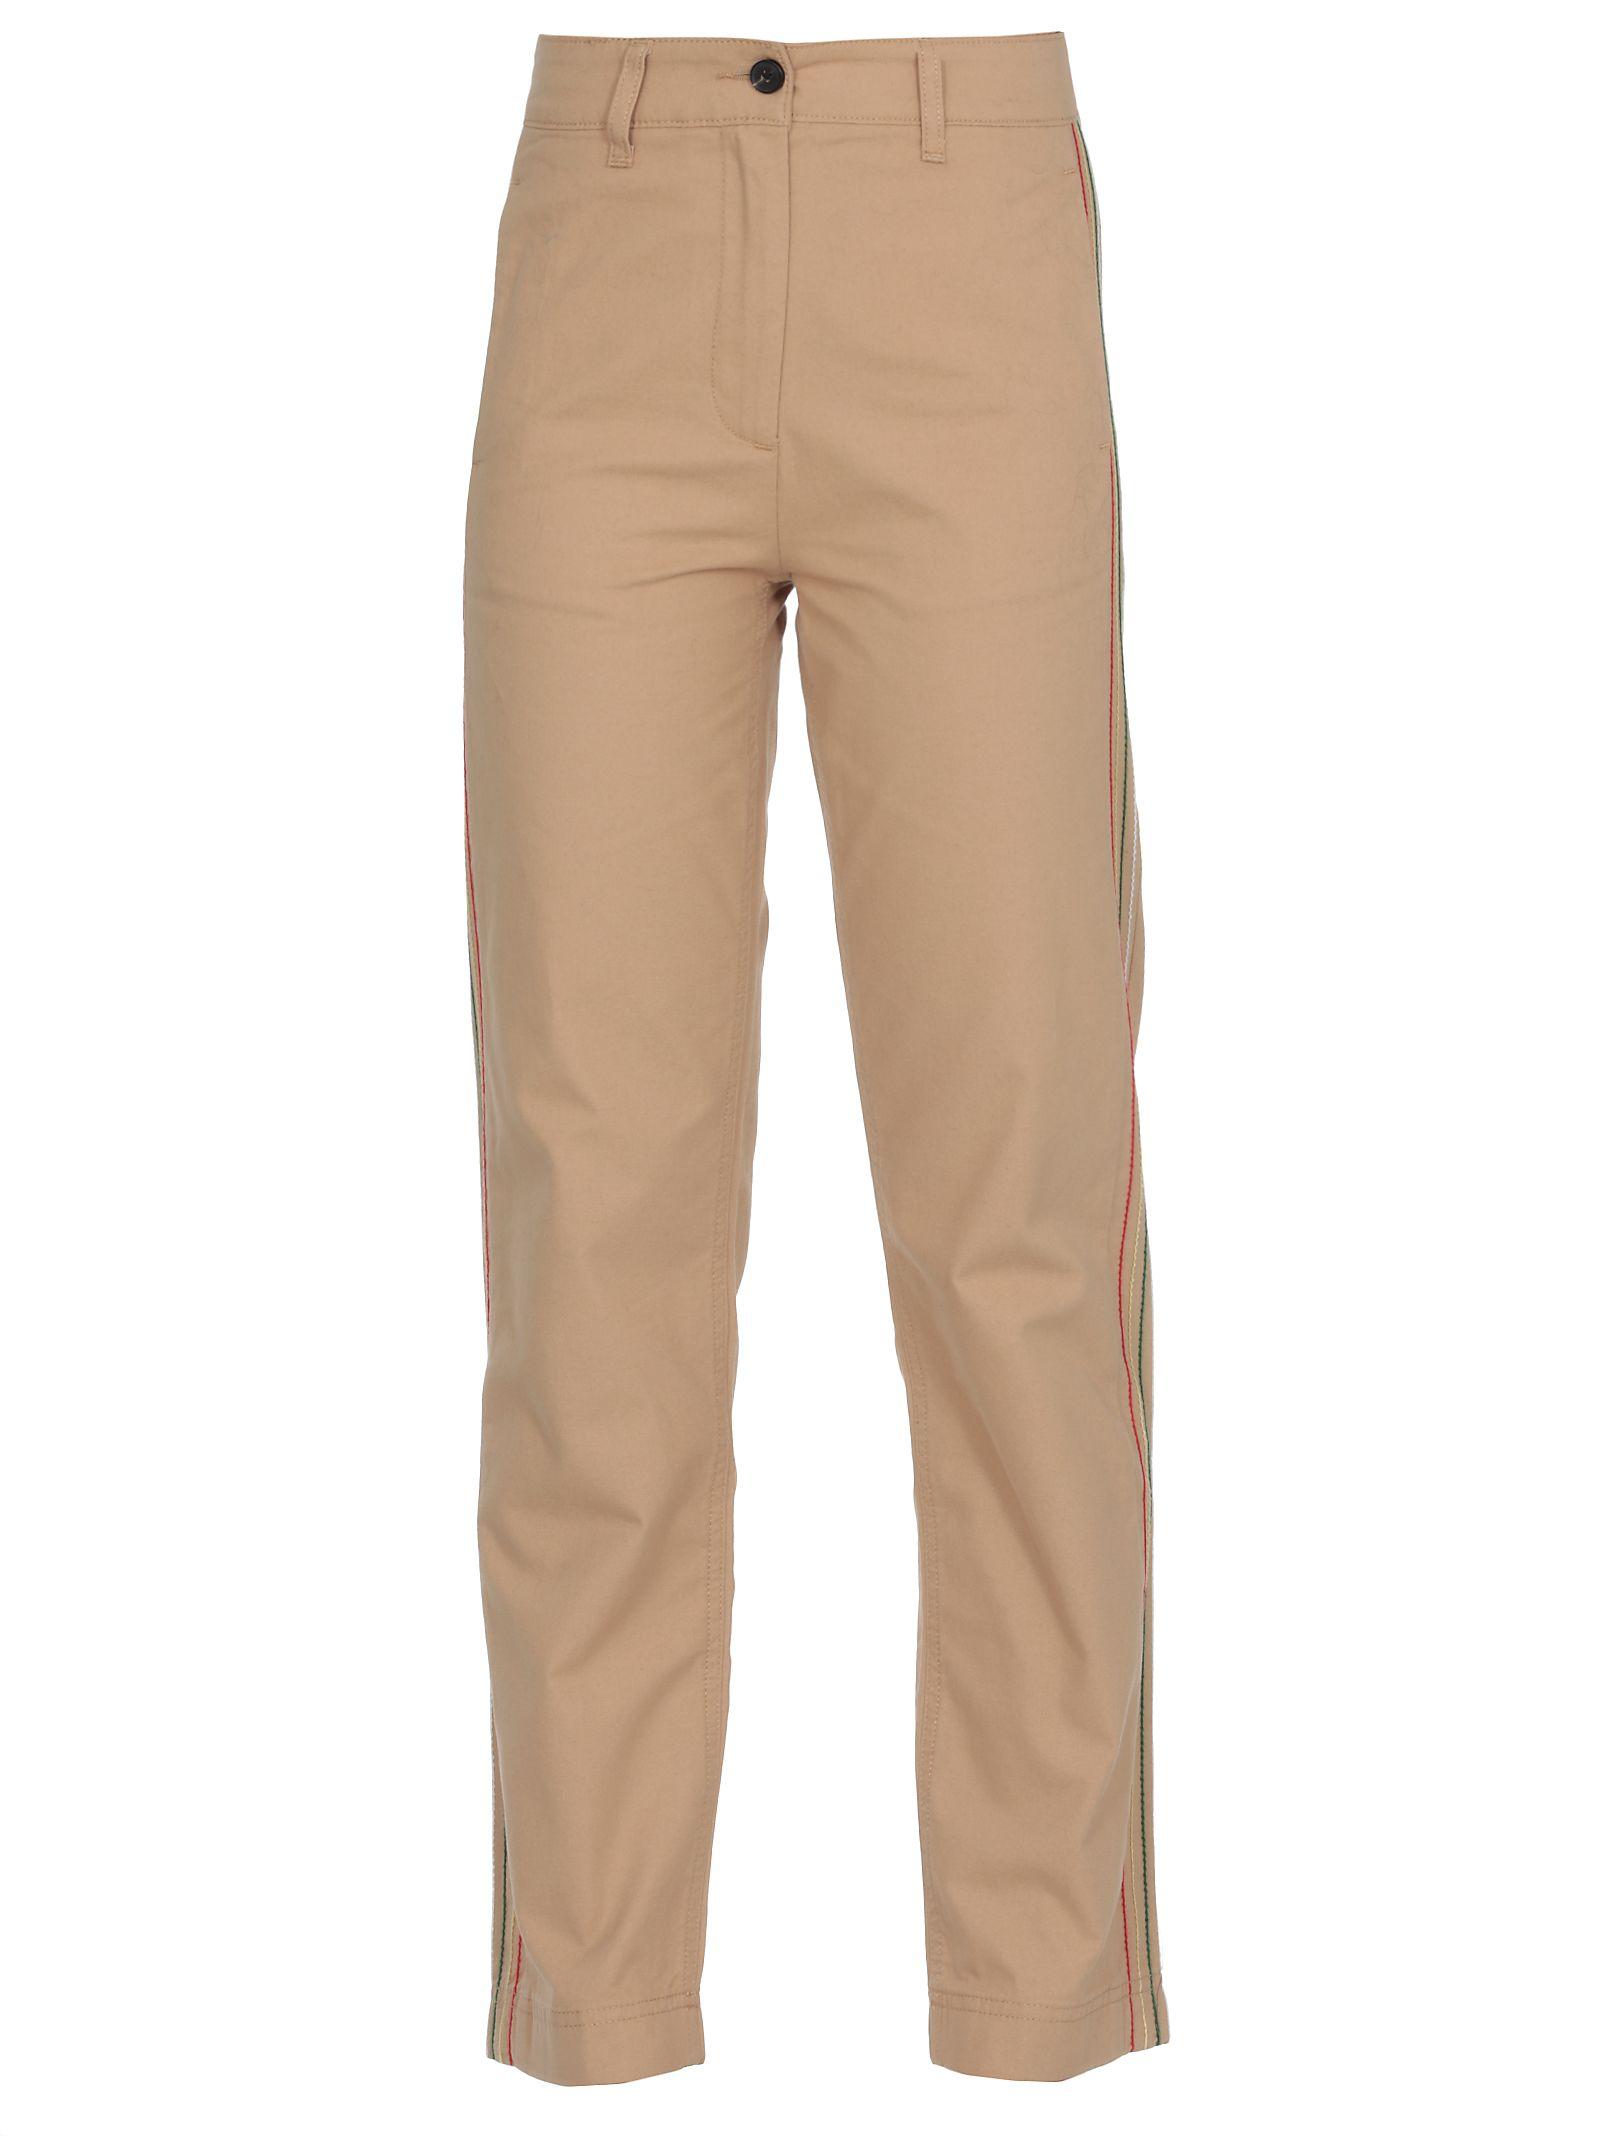 Tommy Hilfiger Aleeza Icon Chino Trousers